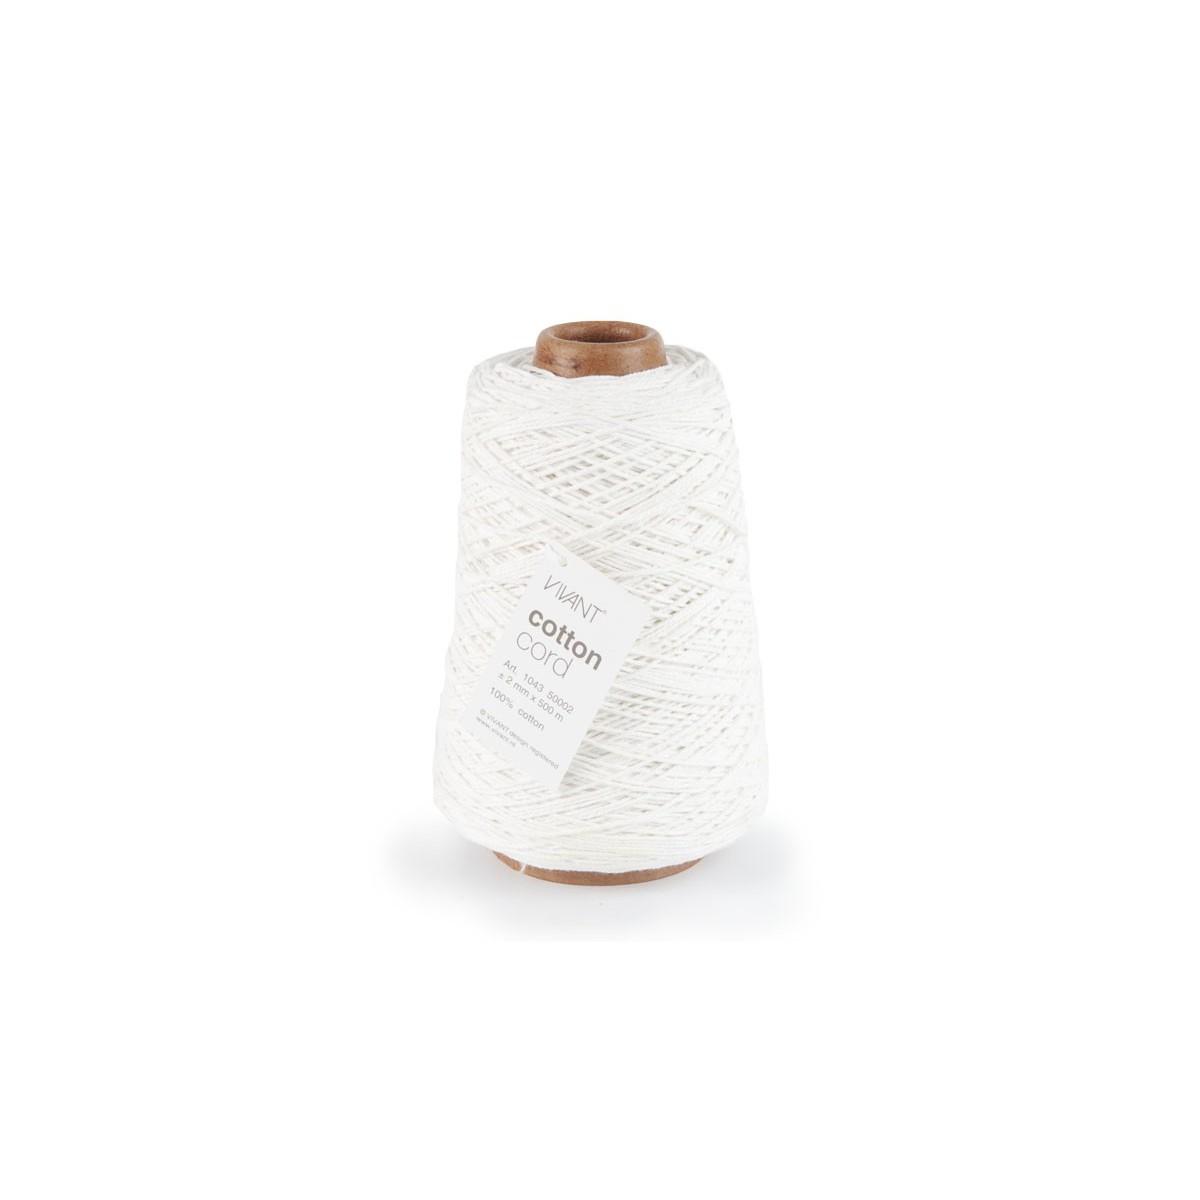 Cotton Cord mm. 2 X 500 Mt. Bianco